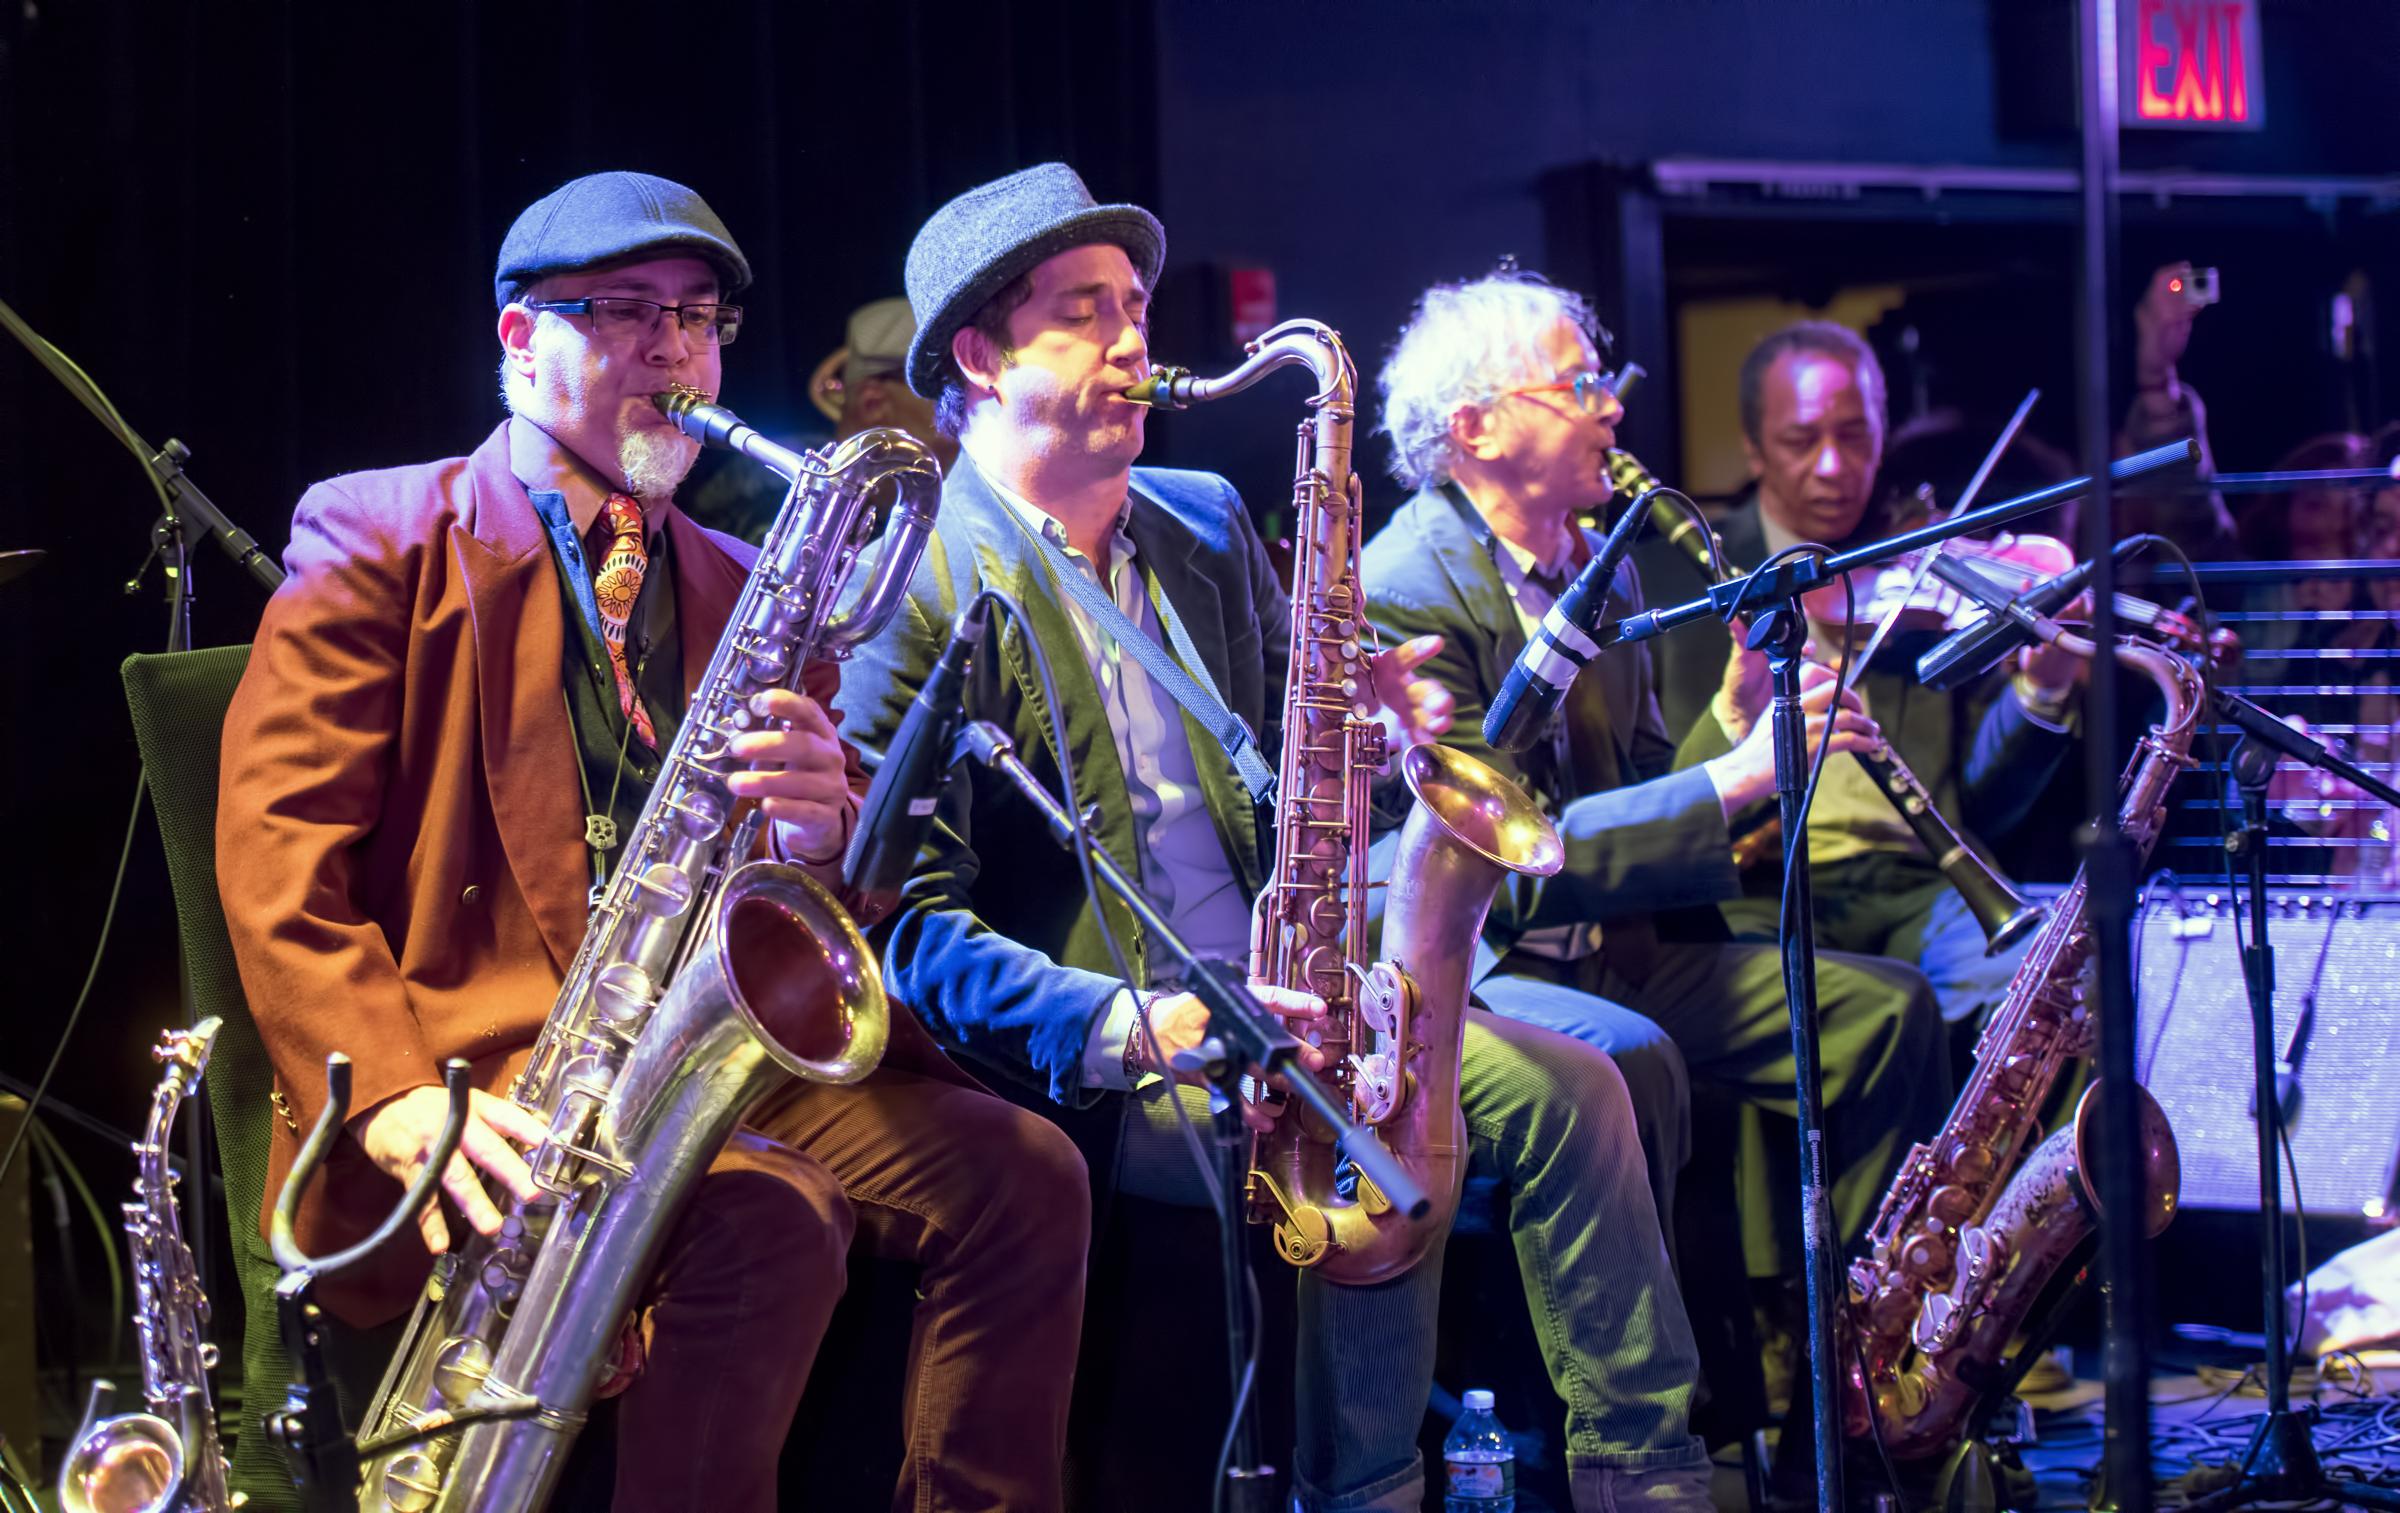 Erik Lawrence, Peter Apfelbaum, Doug Wieselman, Charlie Burnham with Butler, Bernstein & the Hot 9 at the Nyc Winter Jazzfest 2015